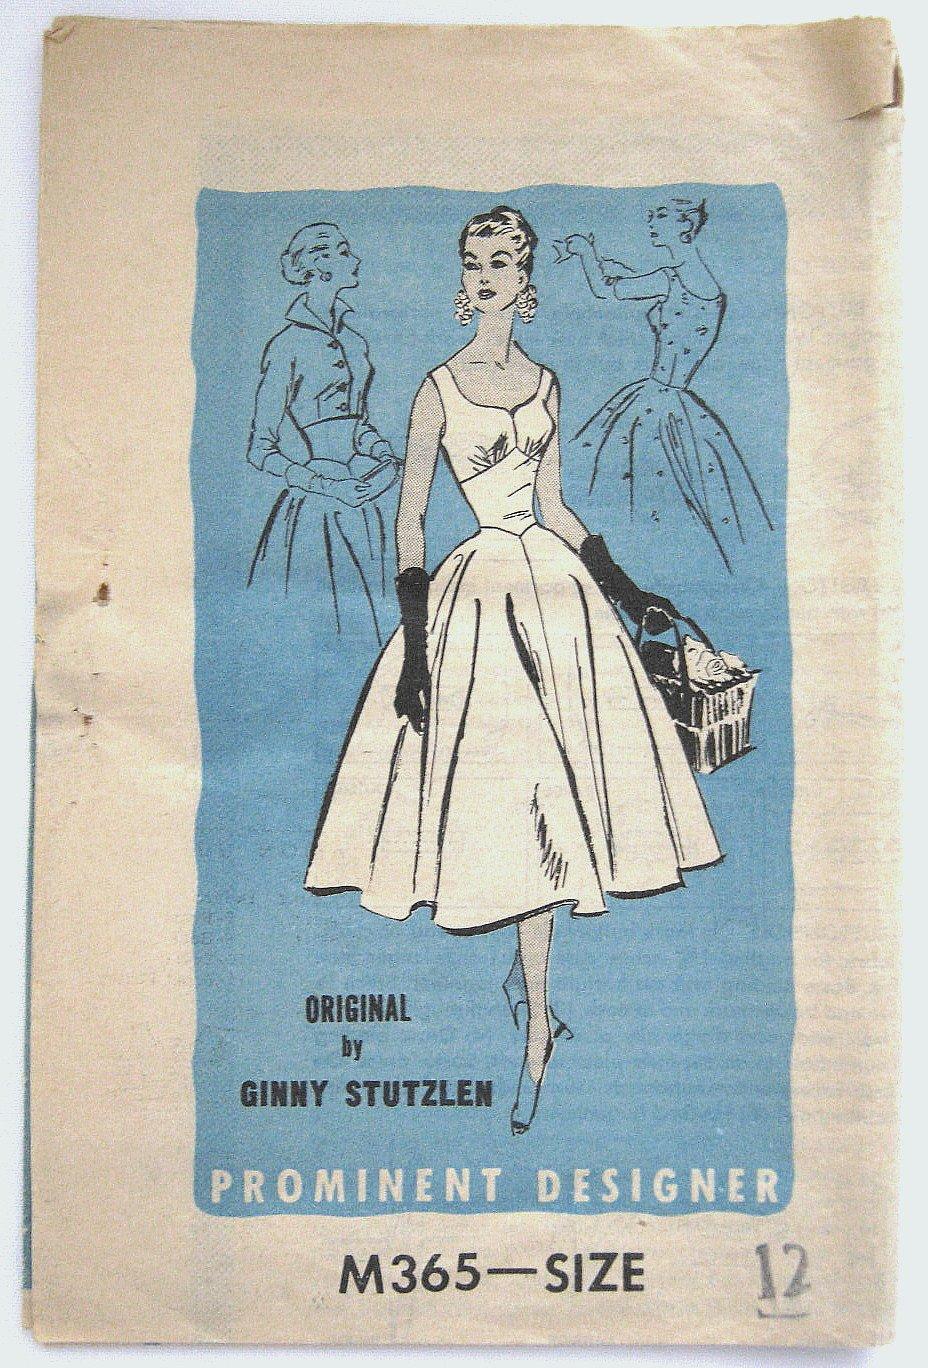 Vintage 1950s Prominent Designer Ginny Stutzlen Dress & Jacket Sewing Pattern M365 Size 12 Bust 30